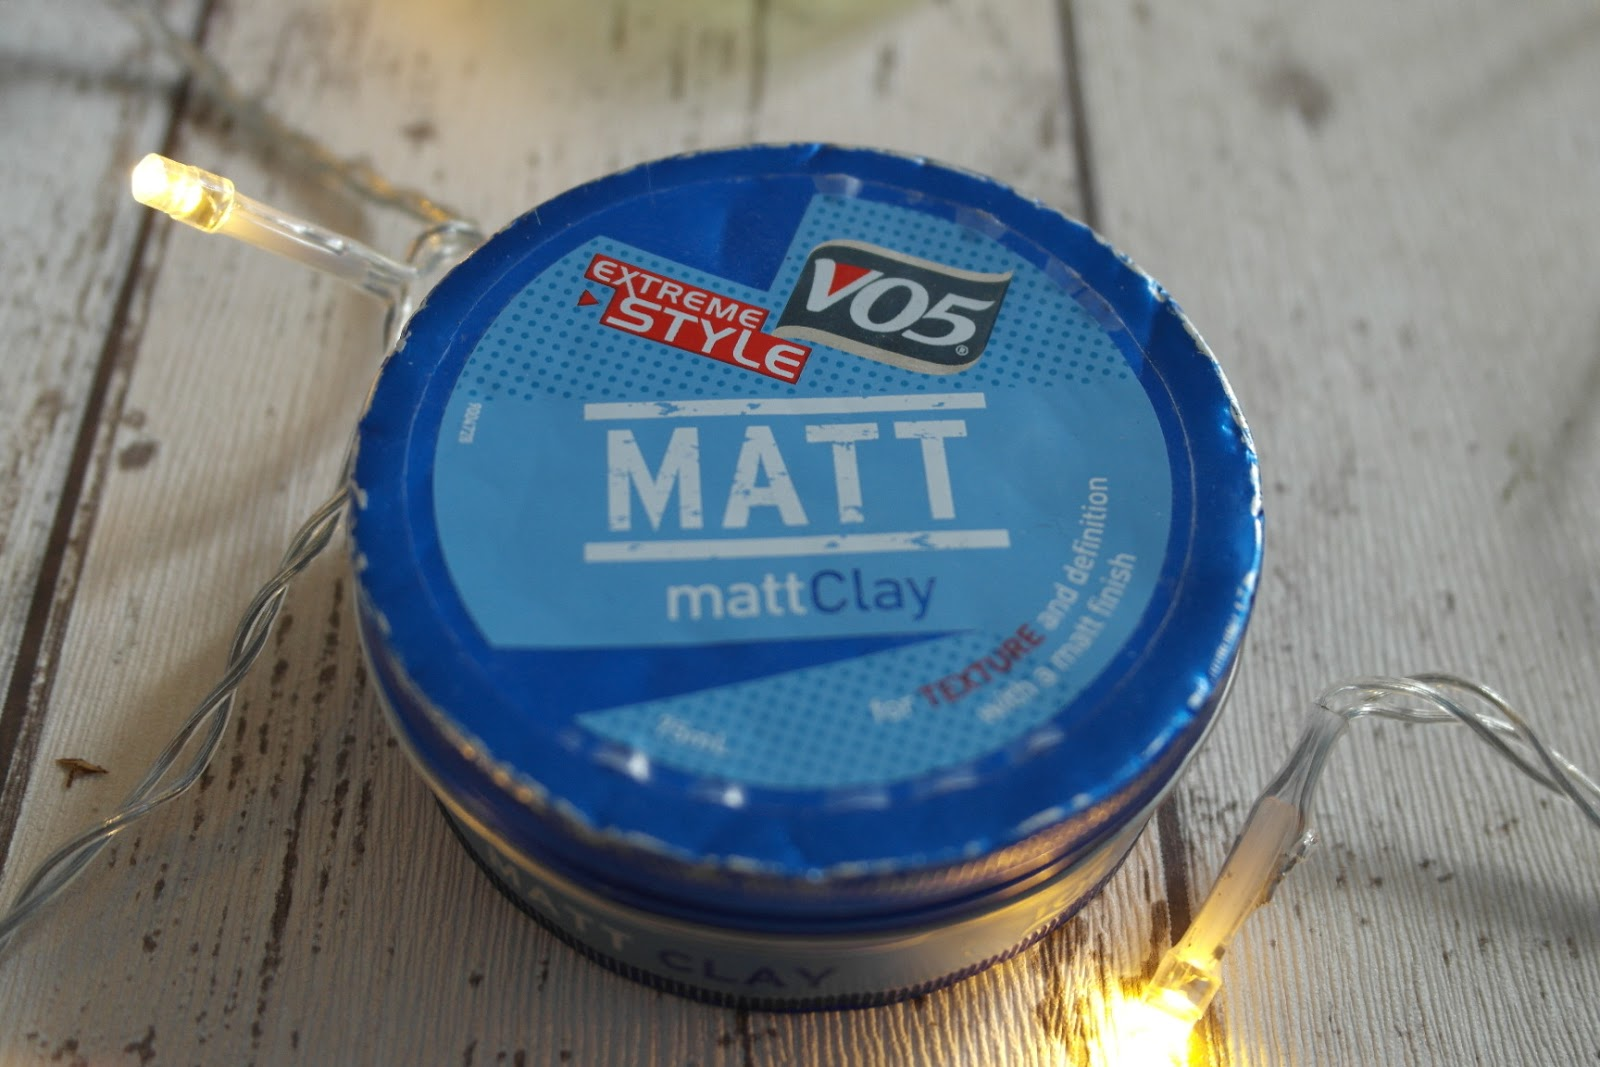 VO5 Extreme Style Matt Clay